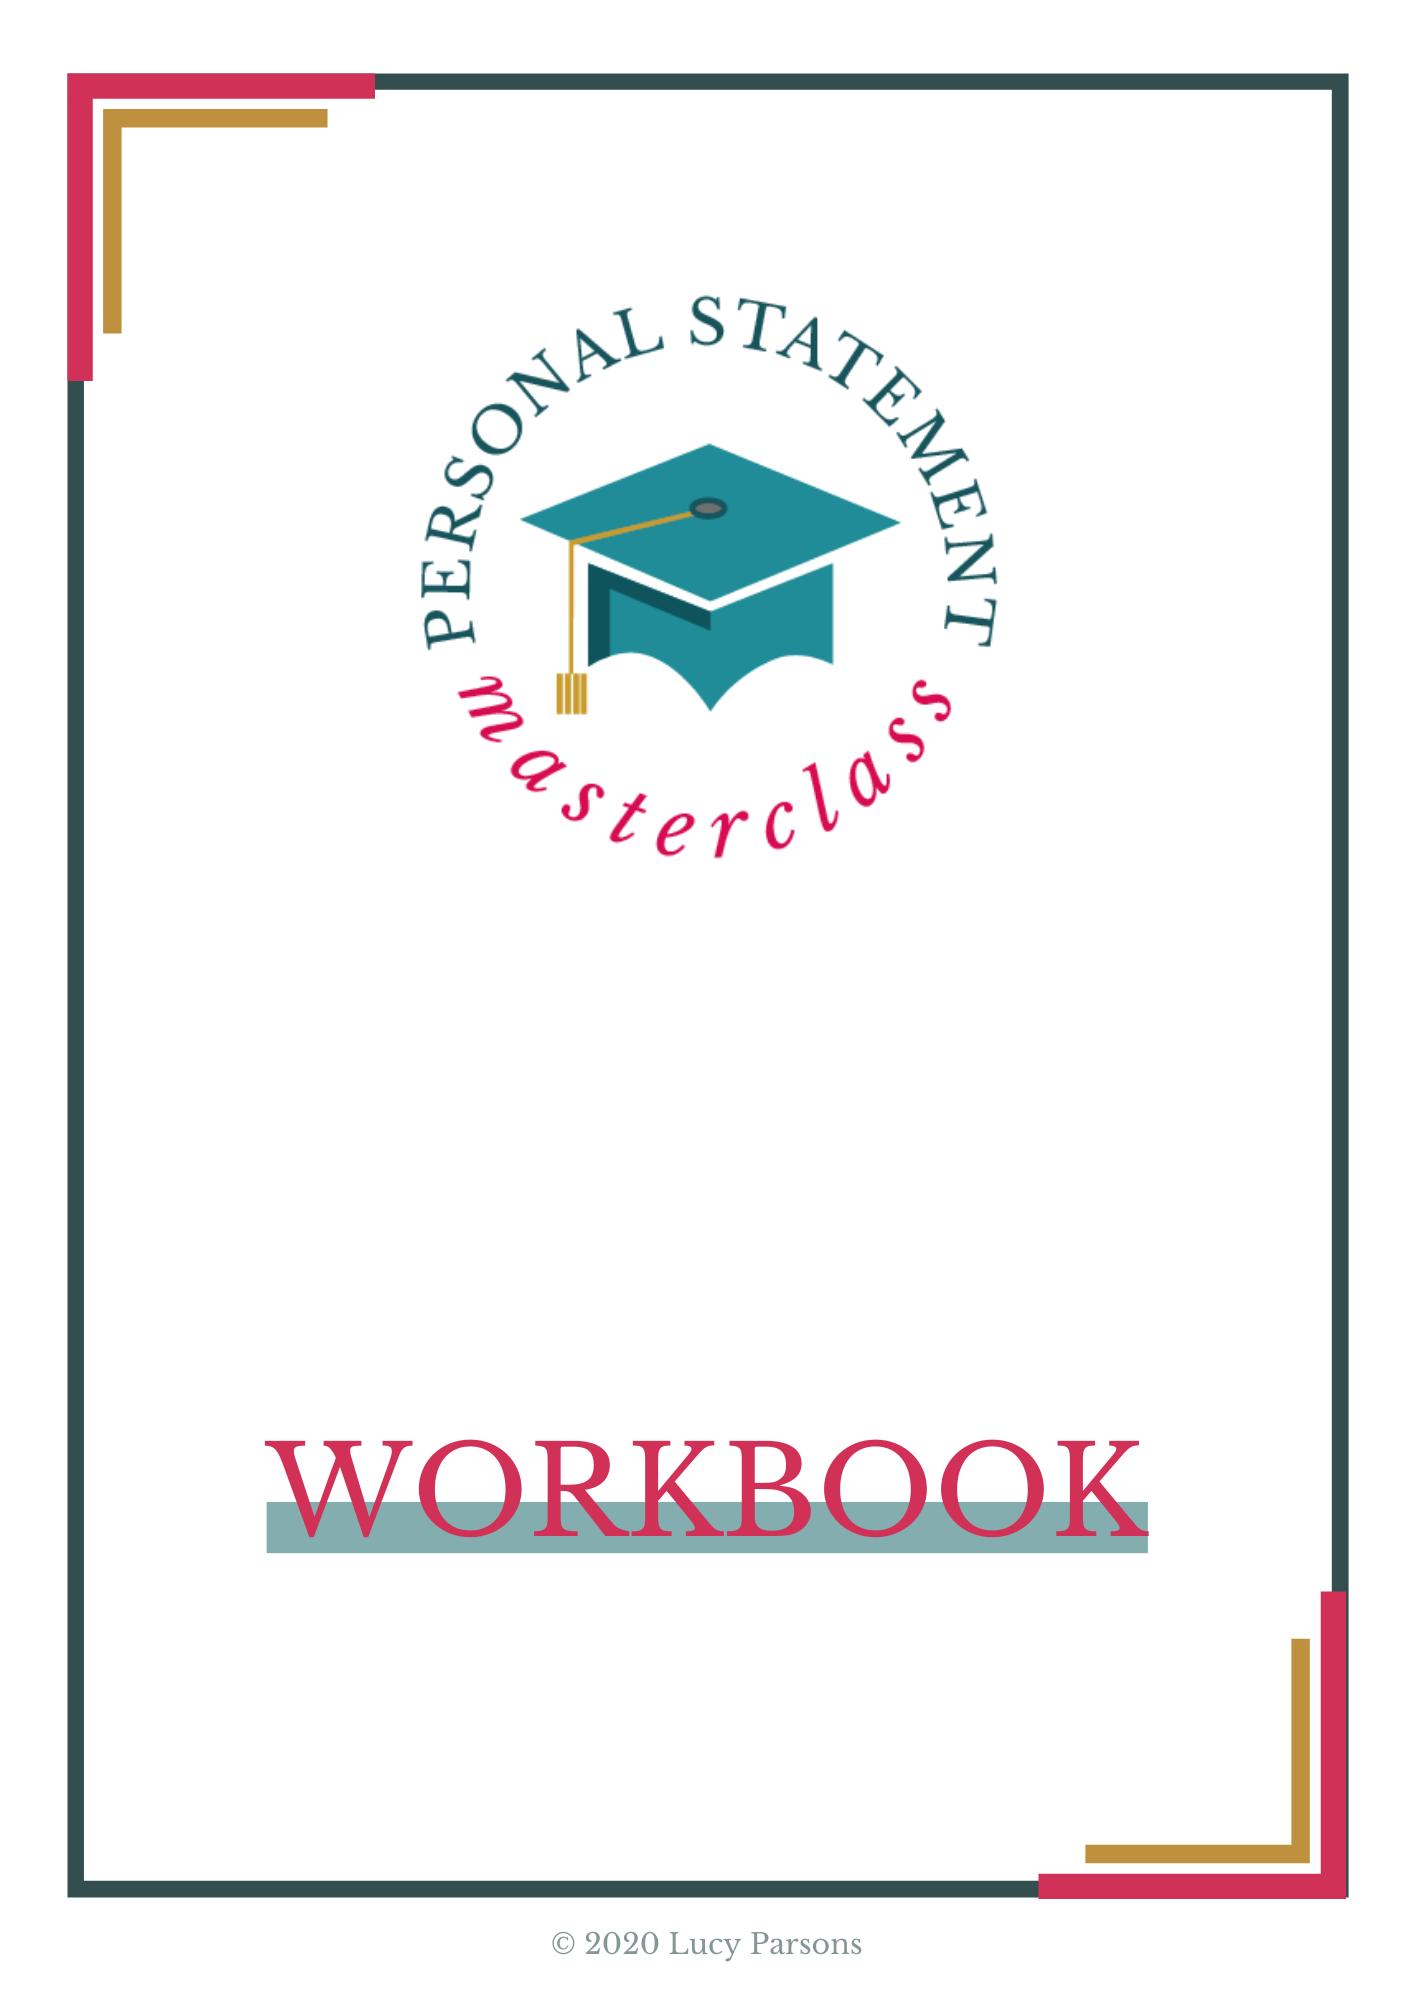 Personal Statement Masterclass workbook